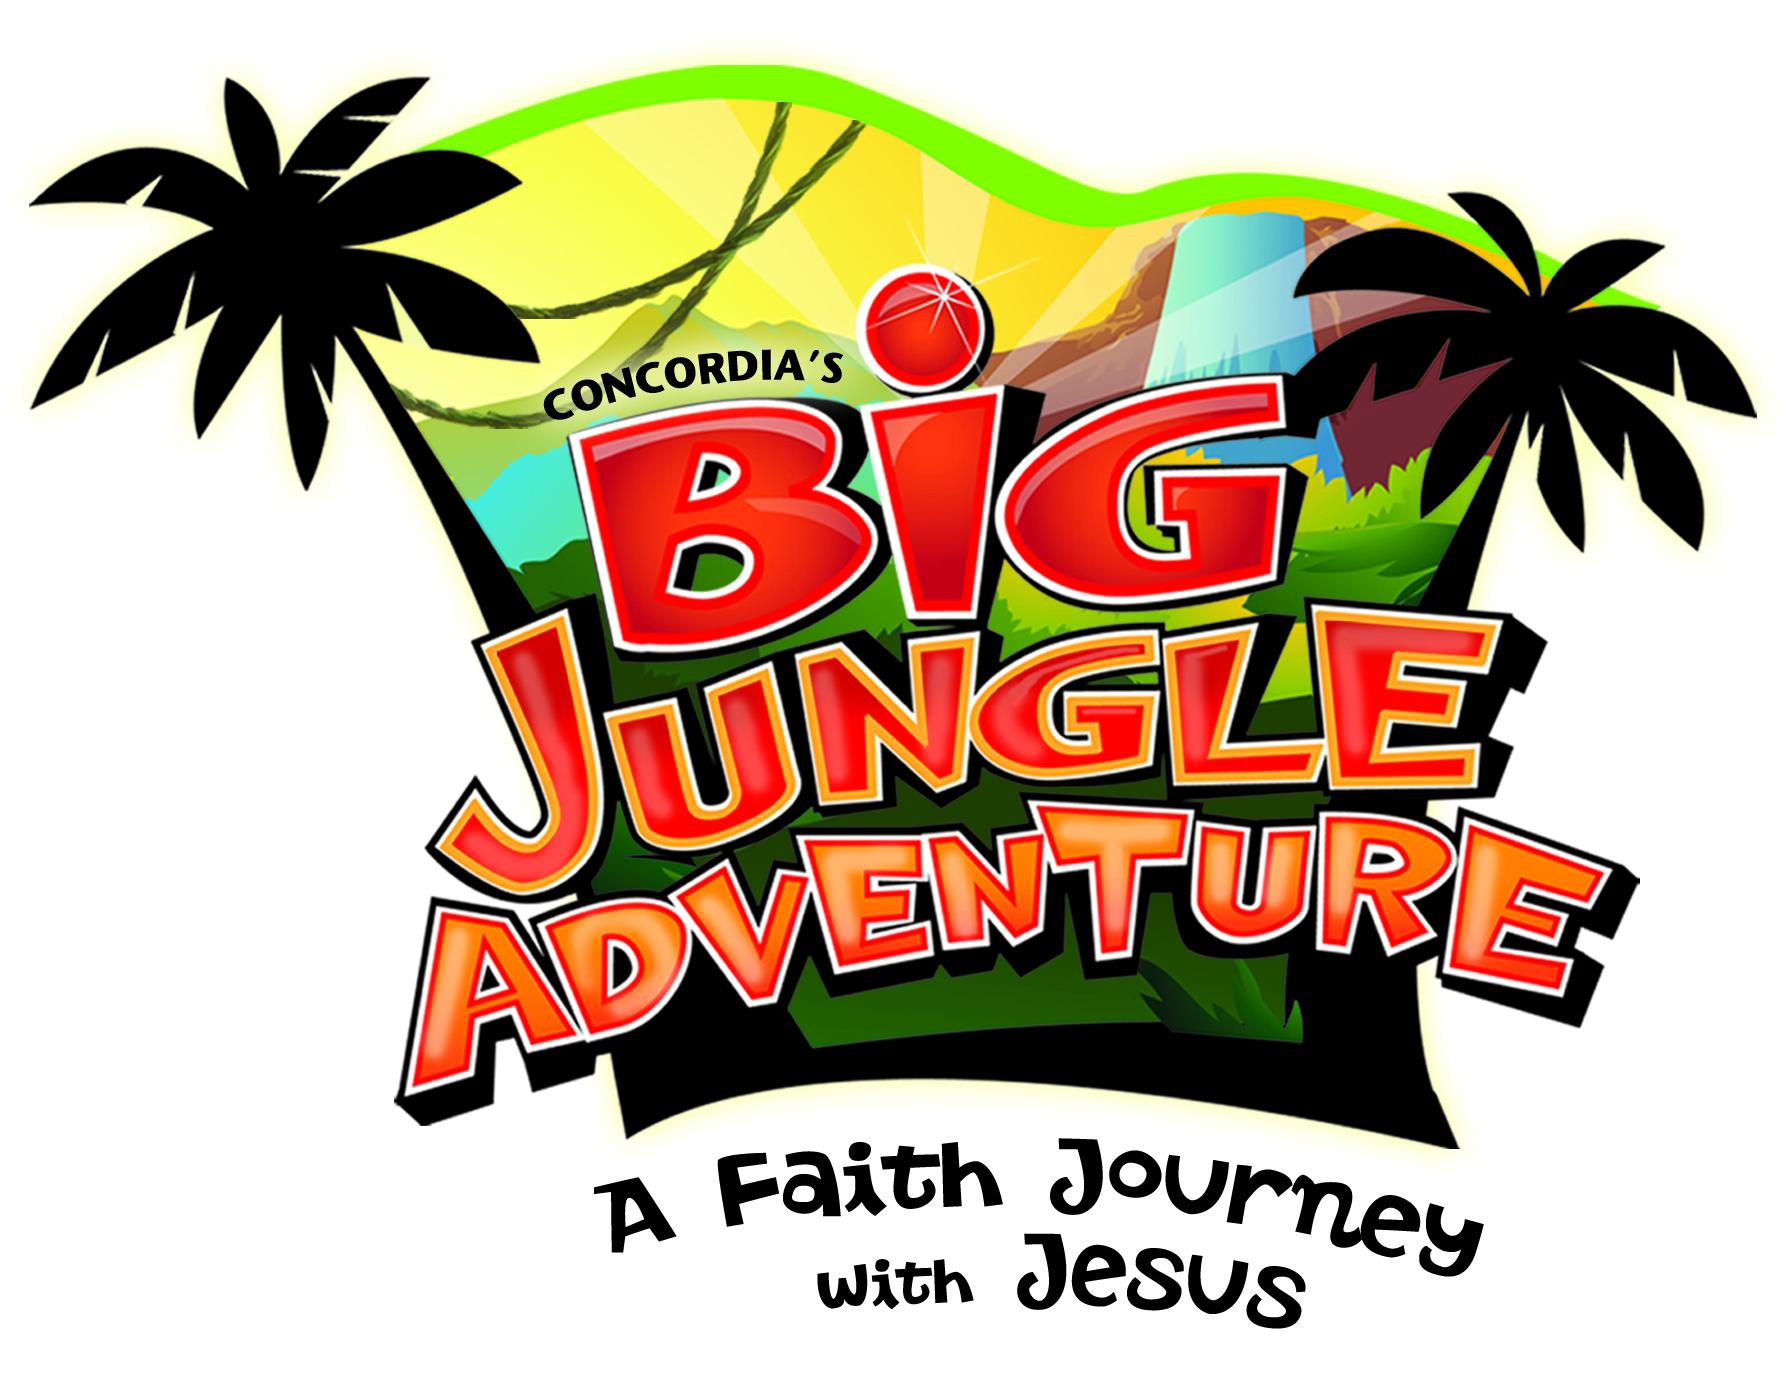 Adventure clipart journey 2011 : Adventure 2011 Adventure